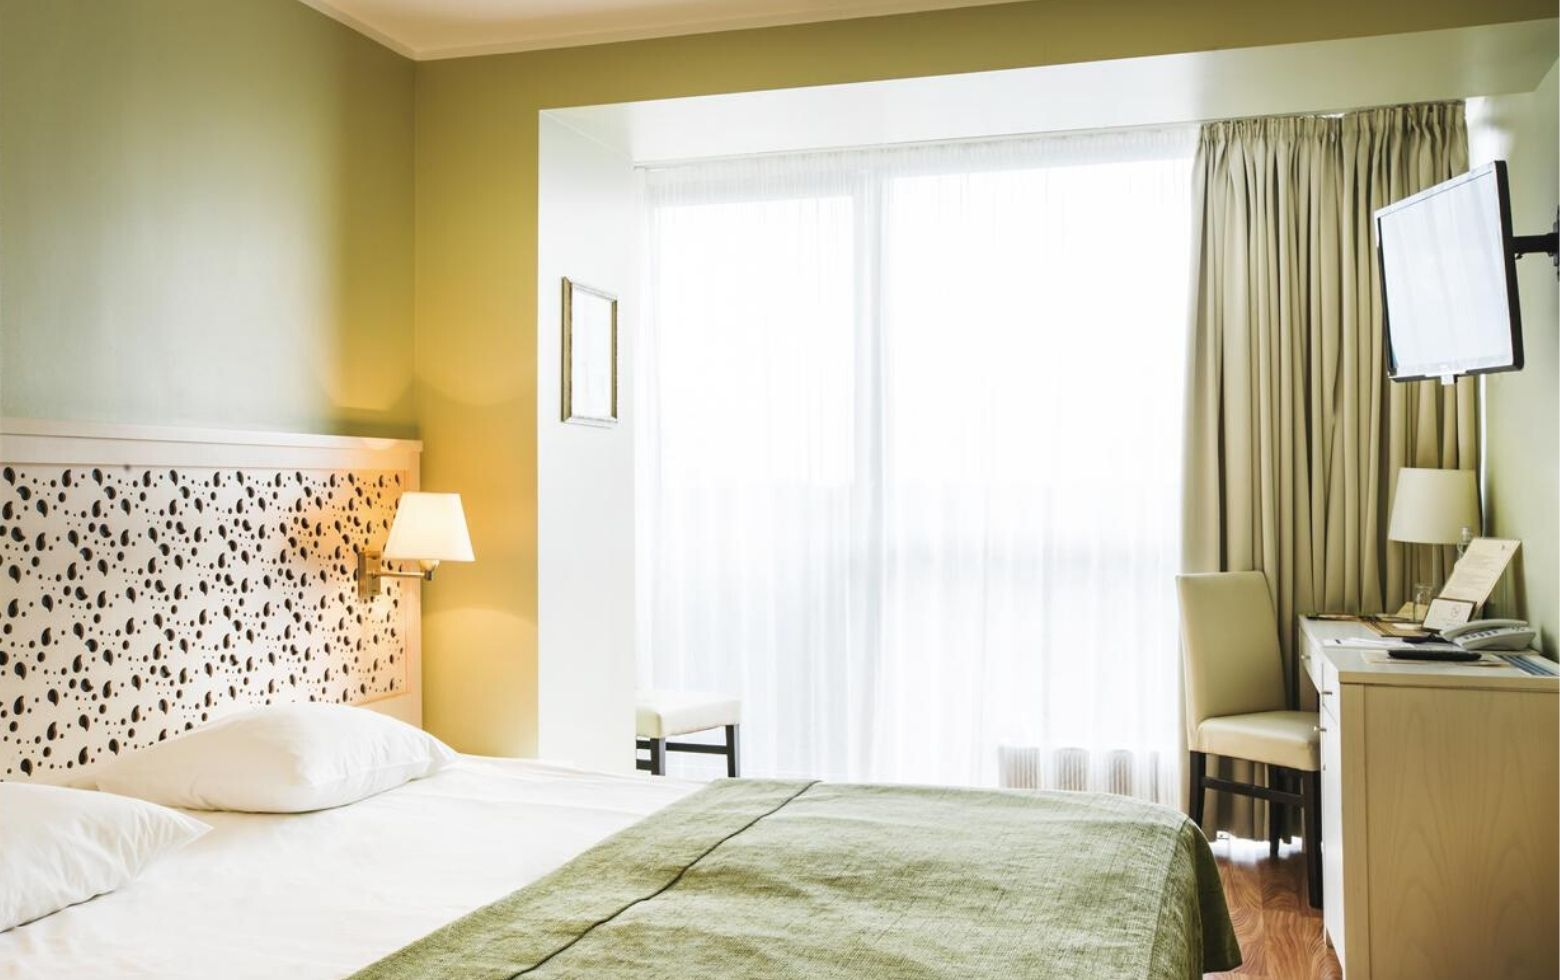 gospa-viesnicas-gal-hotel-jurmala-spa